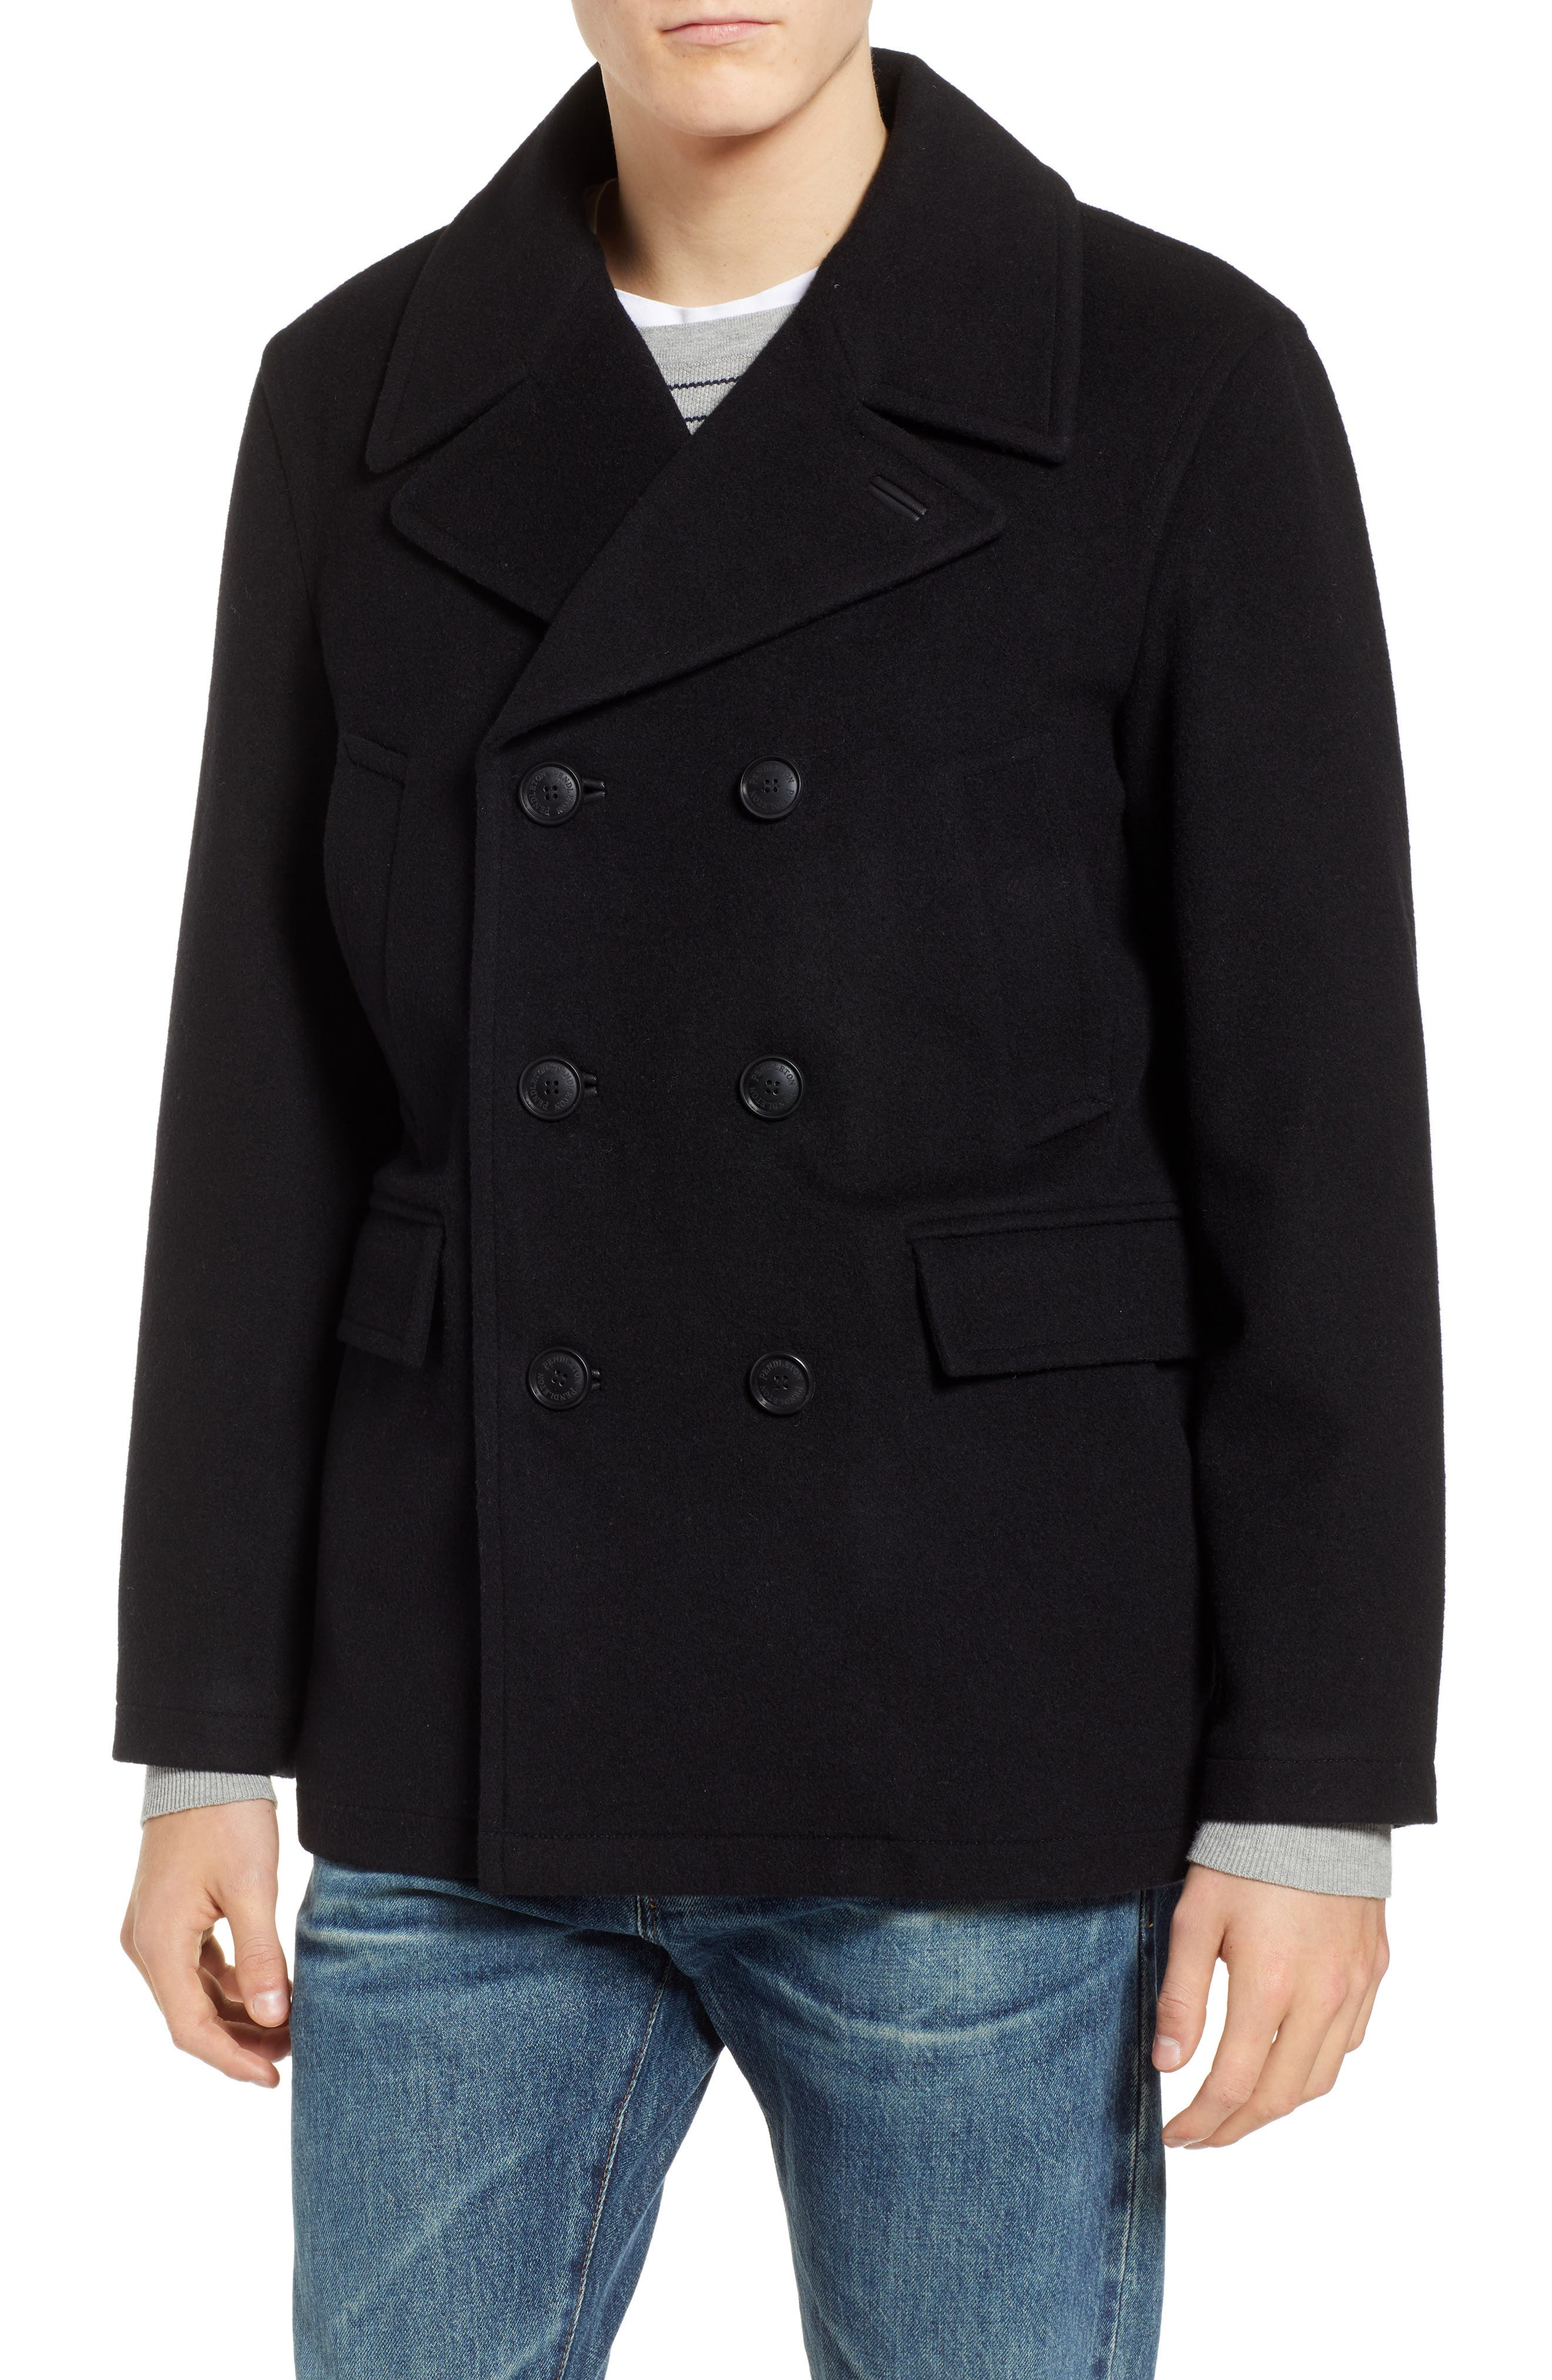 PENDLETON, Maritime Wool Blend Peacoat, Main thumbnail 1, color, BLACK